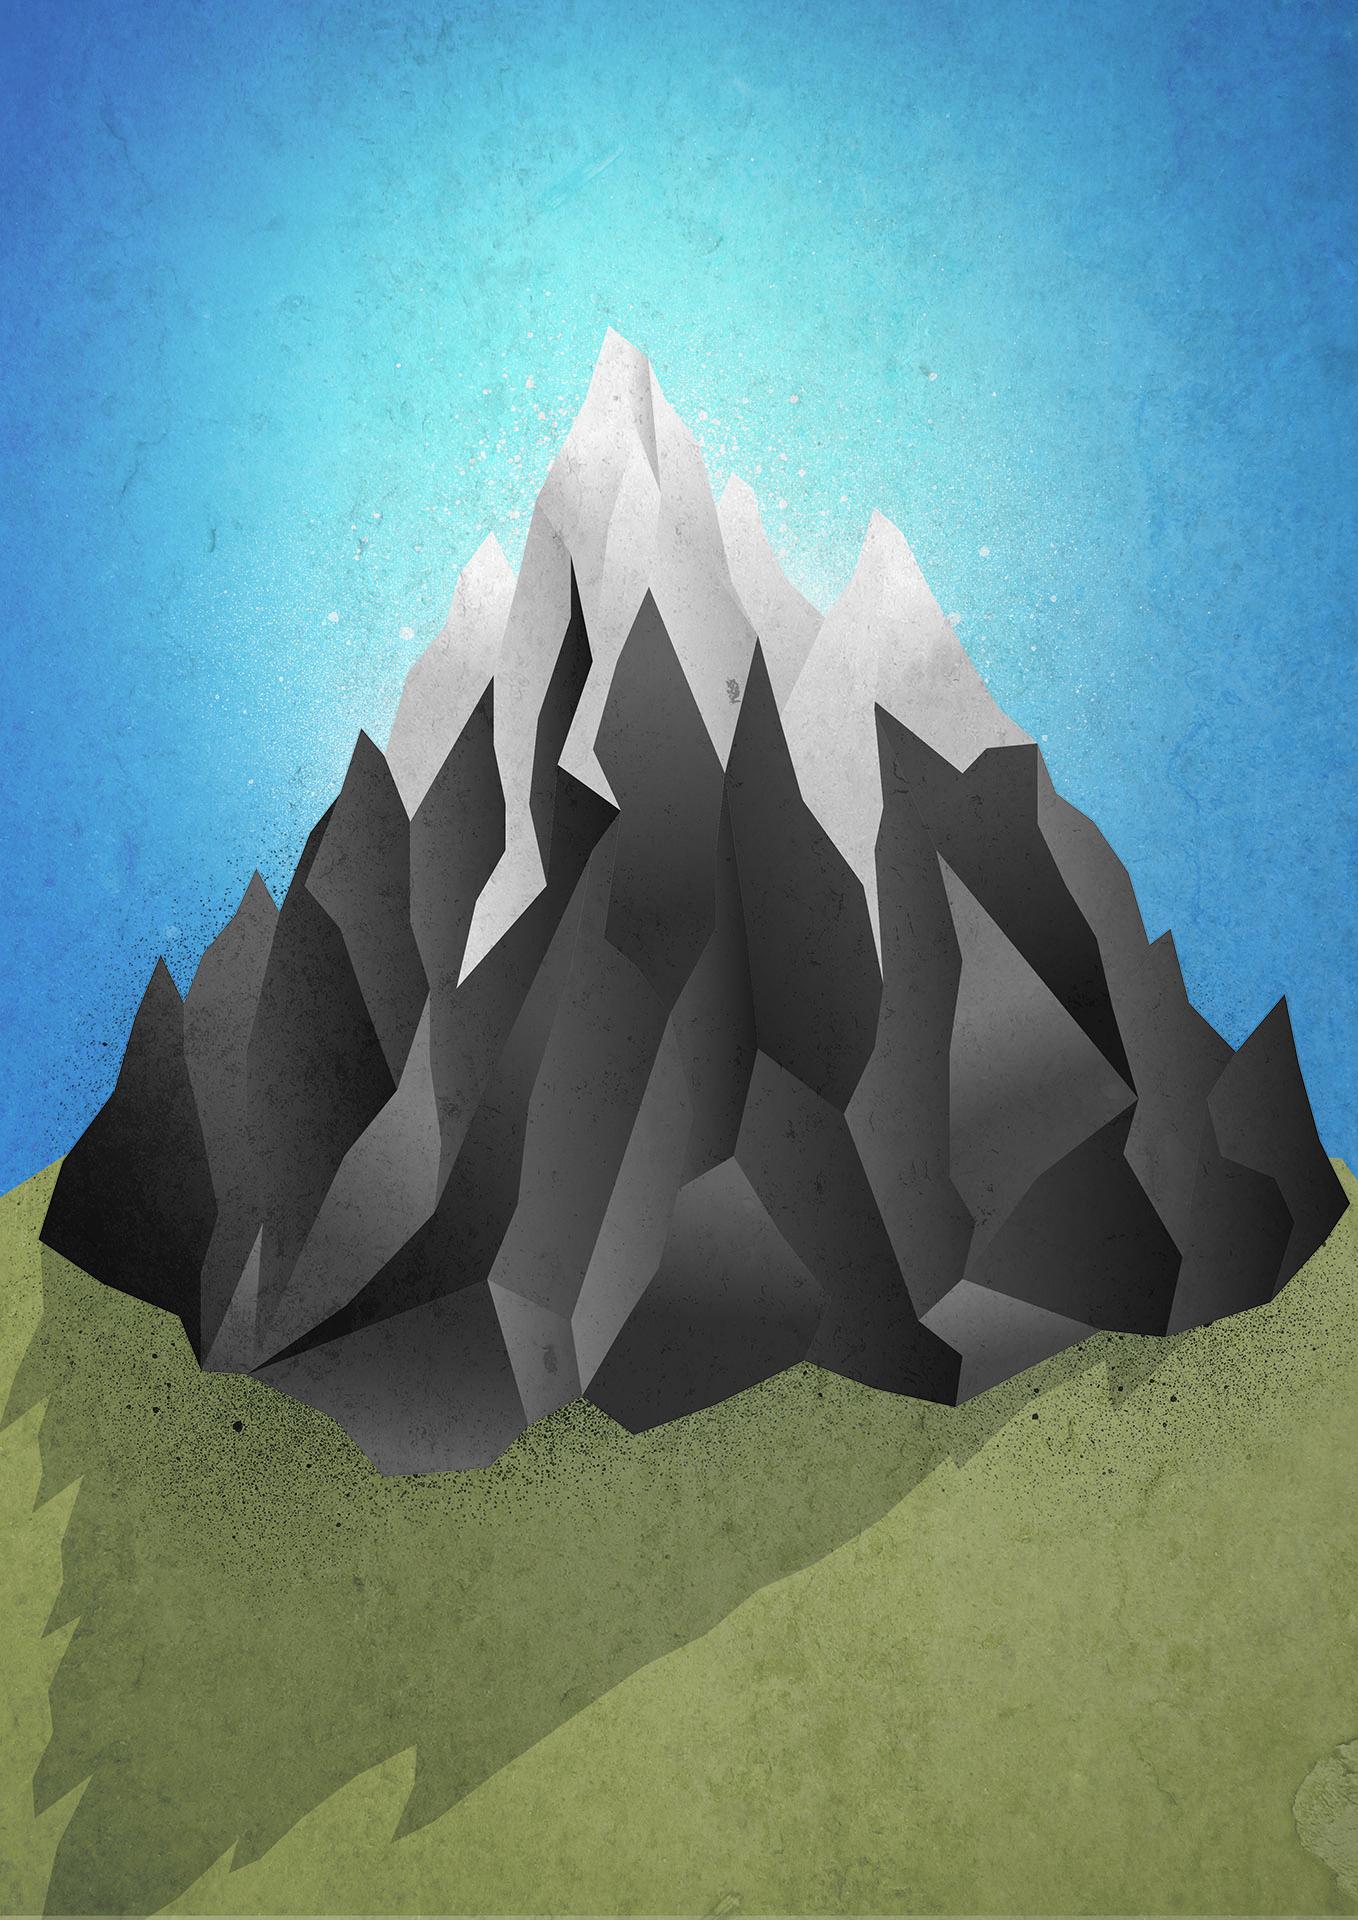 Drawn mountain adobe illustrator Drawn was illustration The Impossible